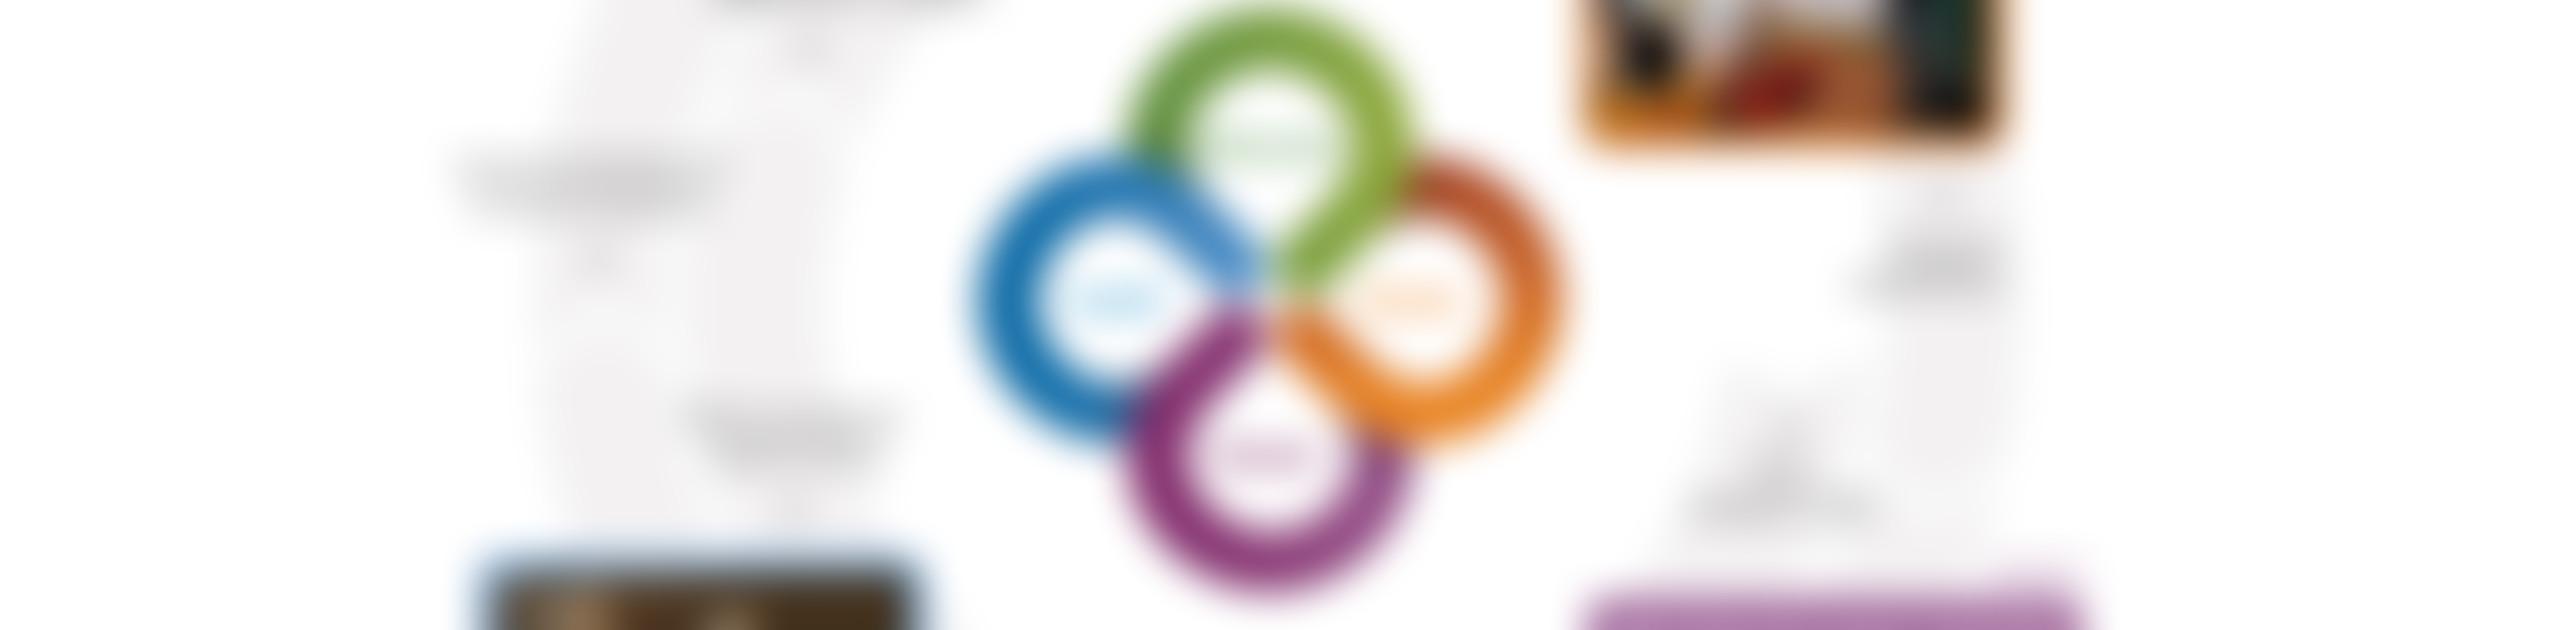 eIAC / Intensive Ambulatory Care program- Philips Design